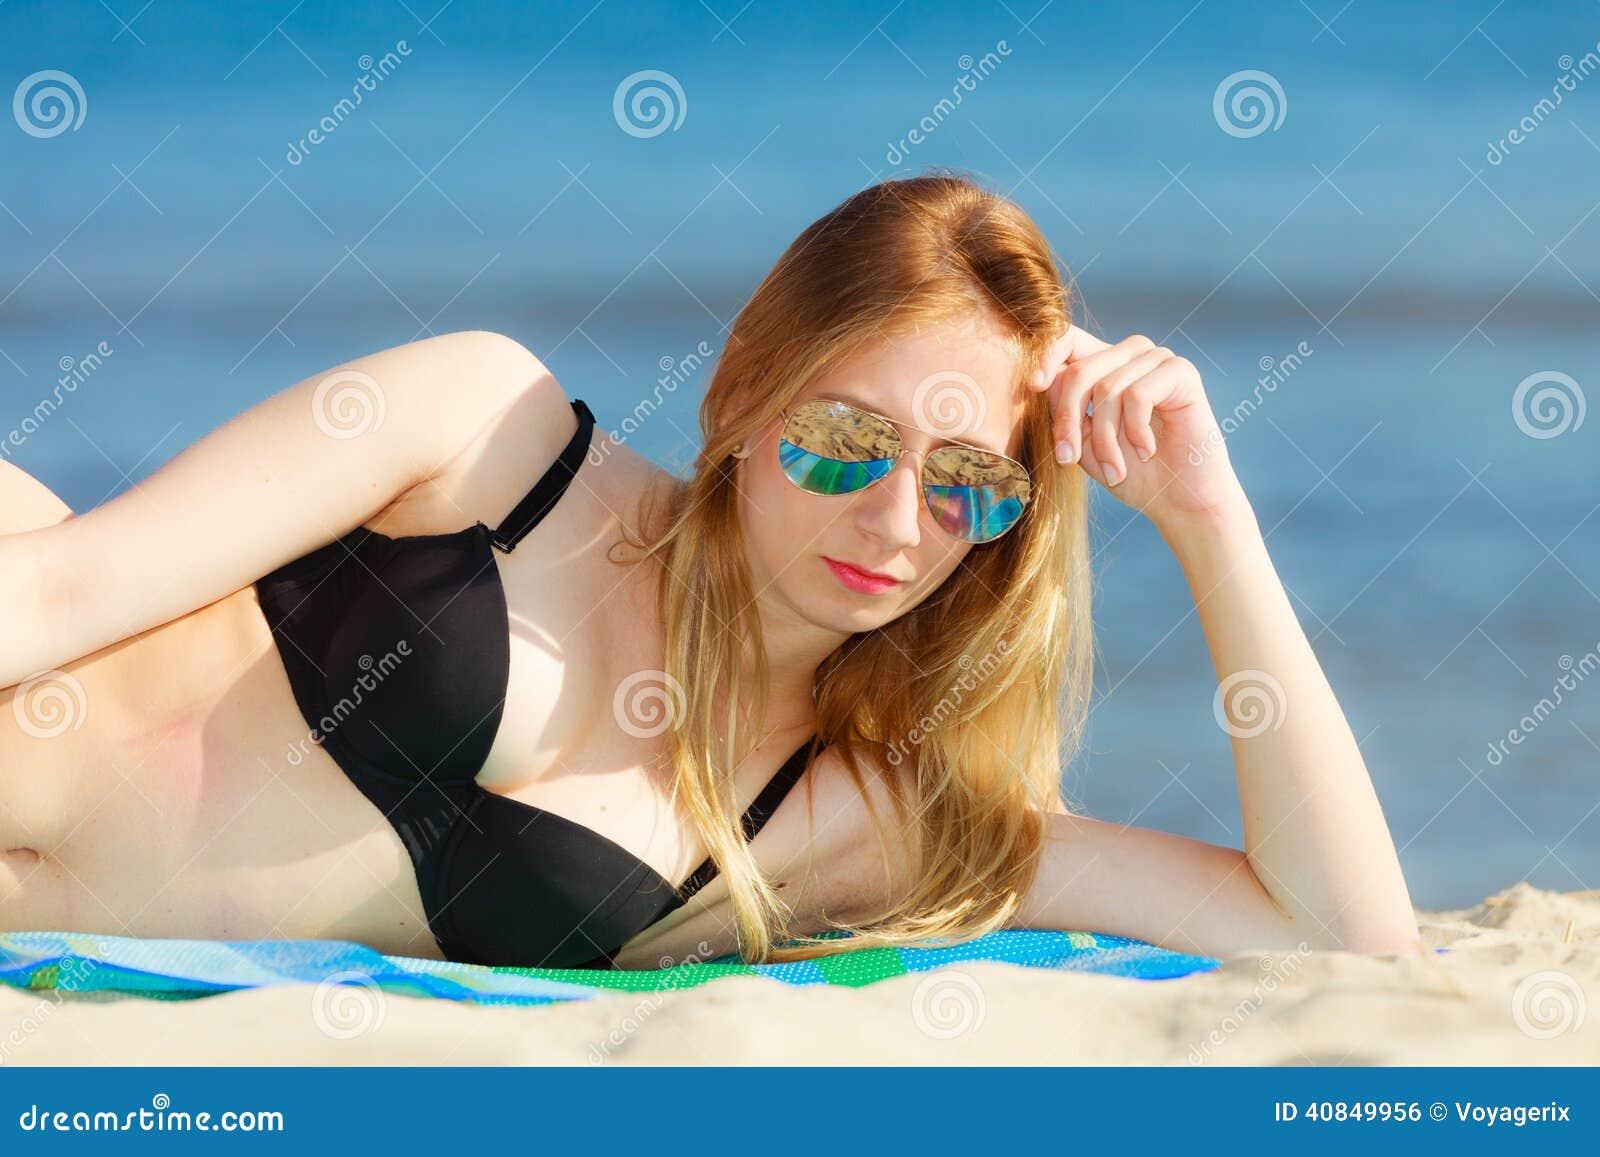 image Summer swimsuit girls relax lower body japa